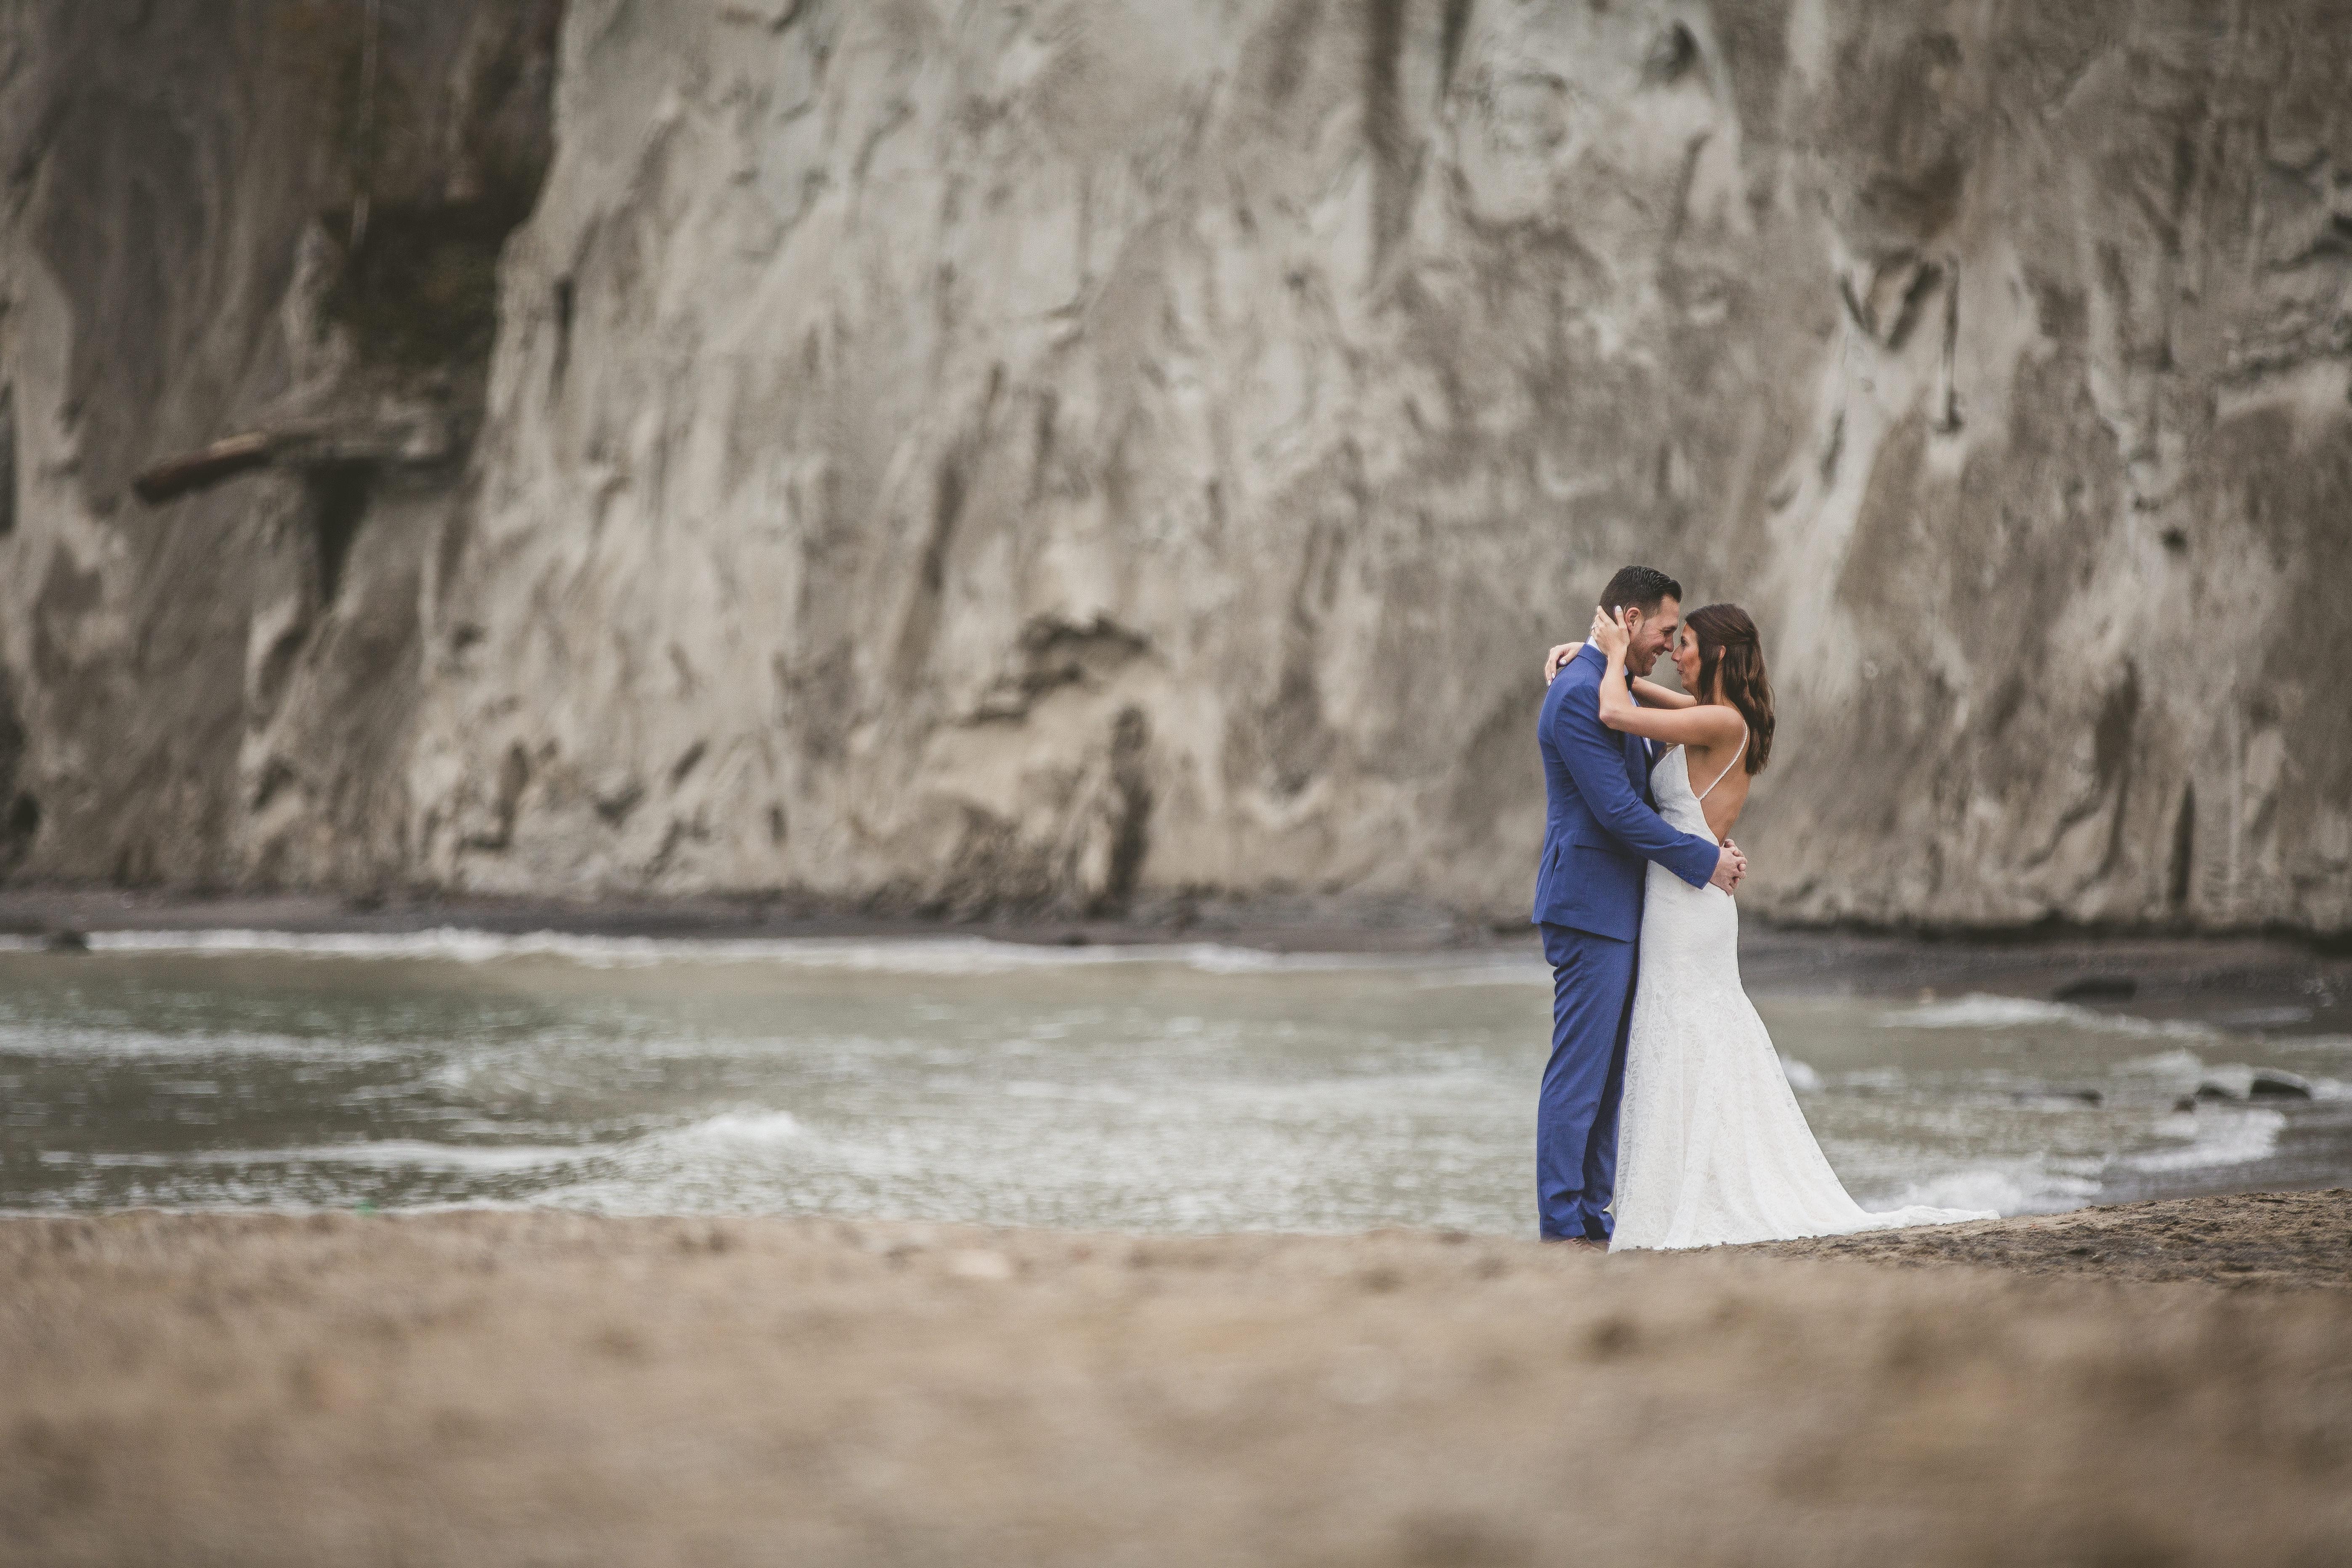 scarborough bluffs wedding photos 44 - Scarborough Bluffs Wedding Photos